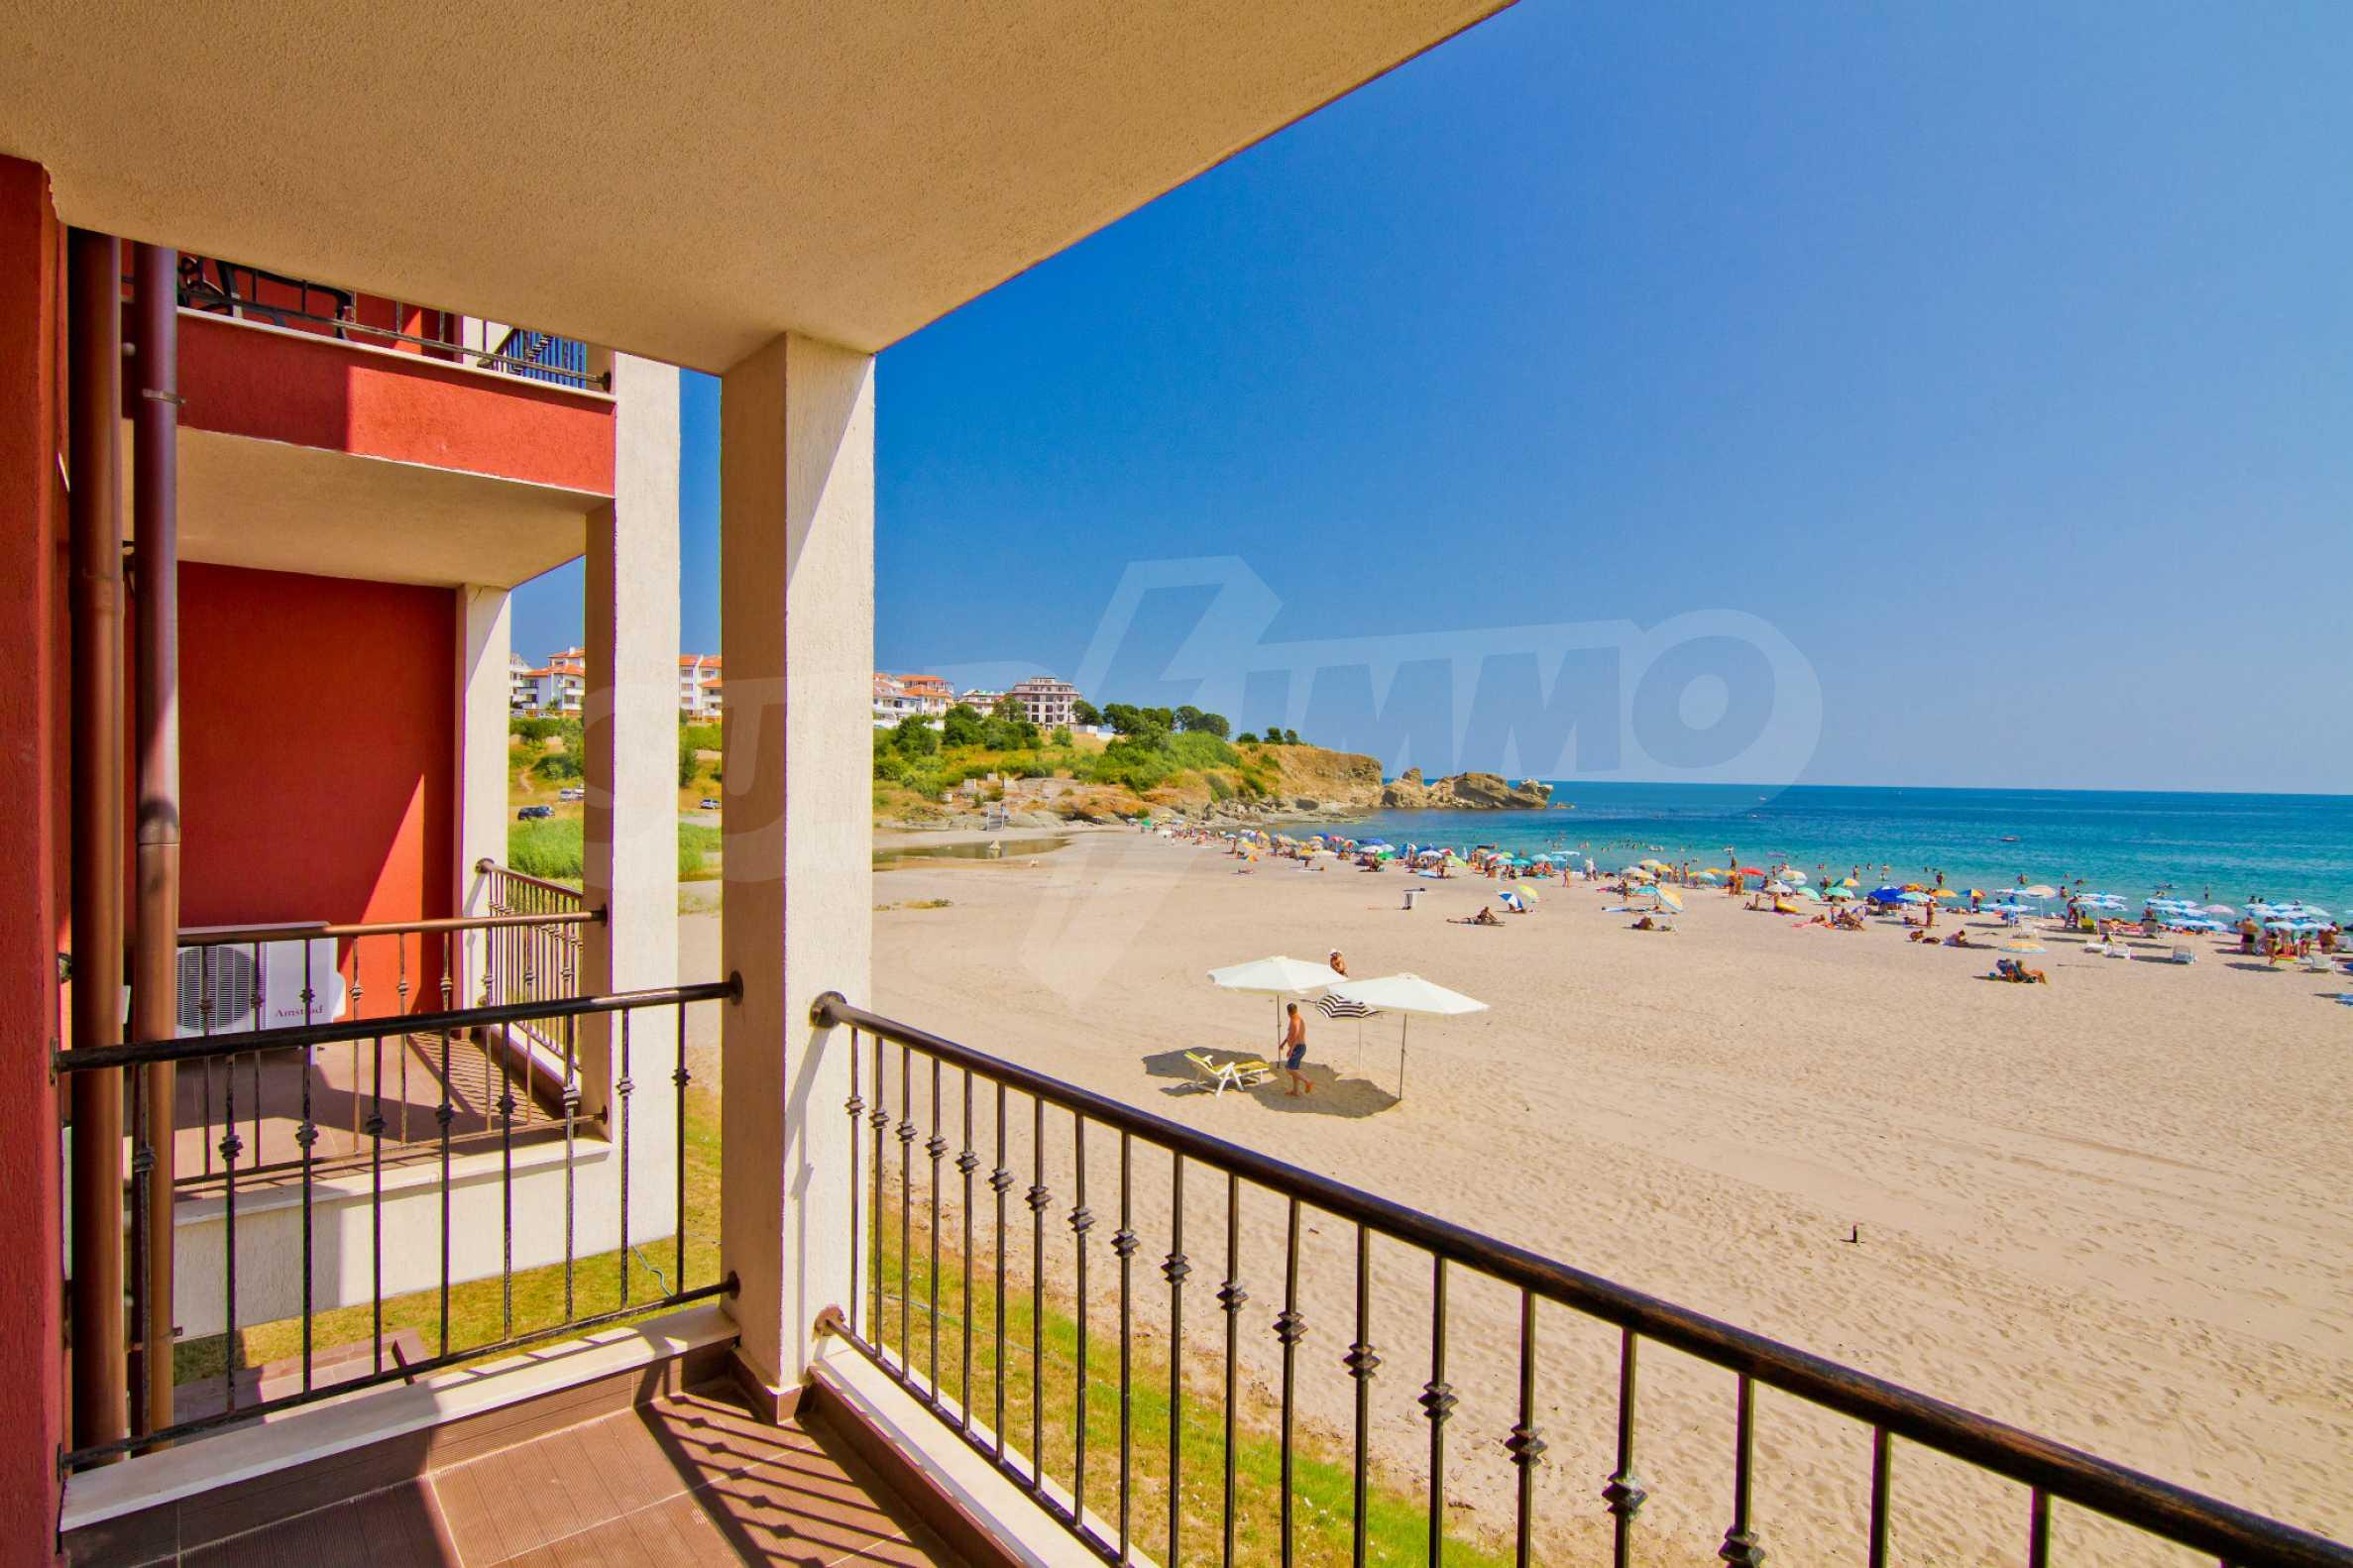 Примеа Бийч Резиденс / Primea Beach Residence 54